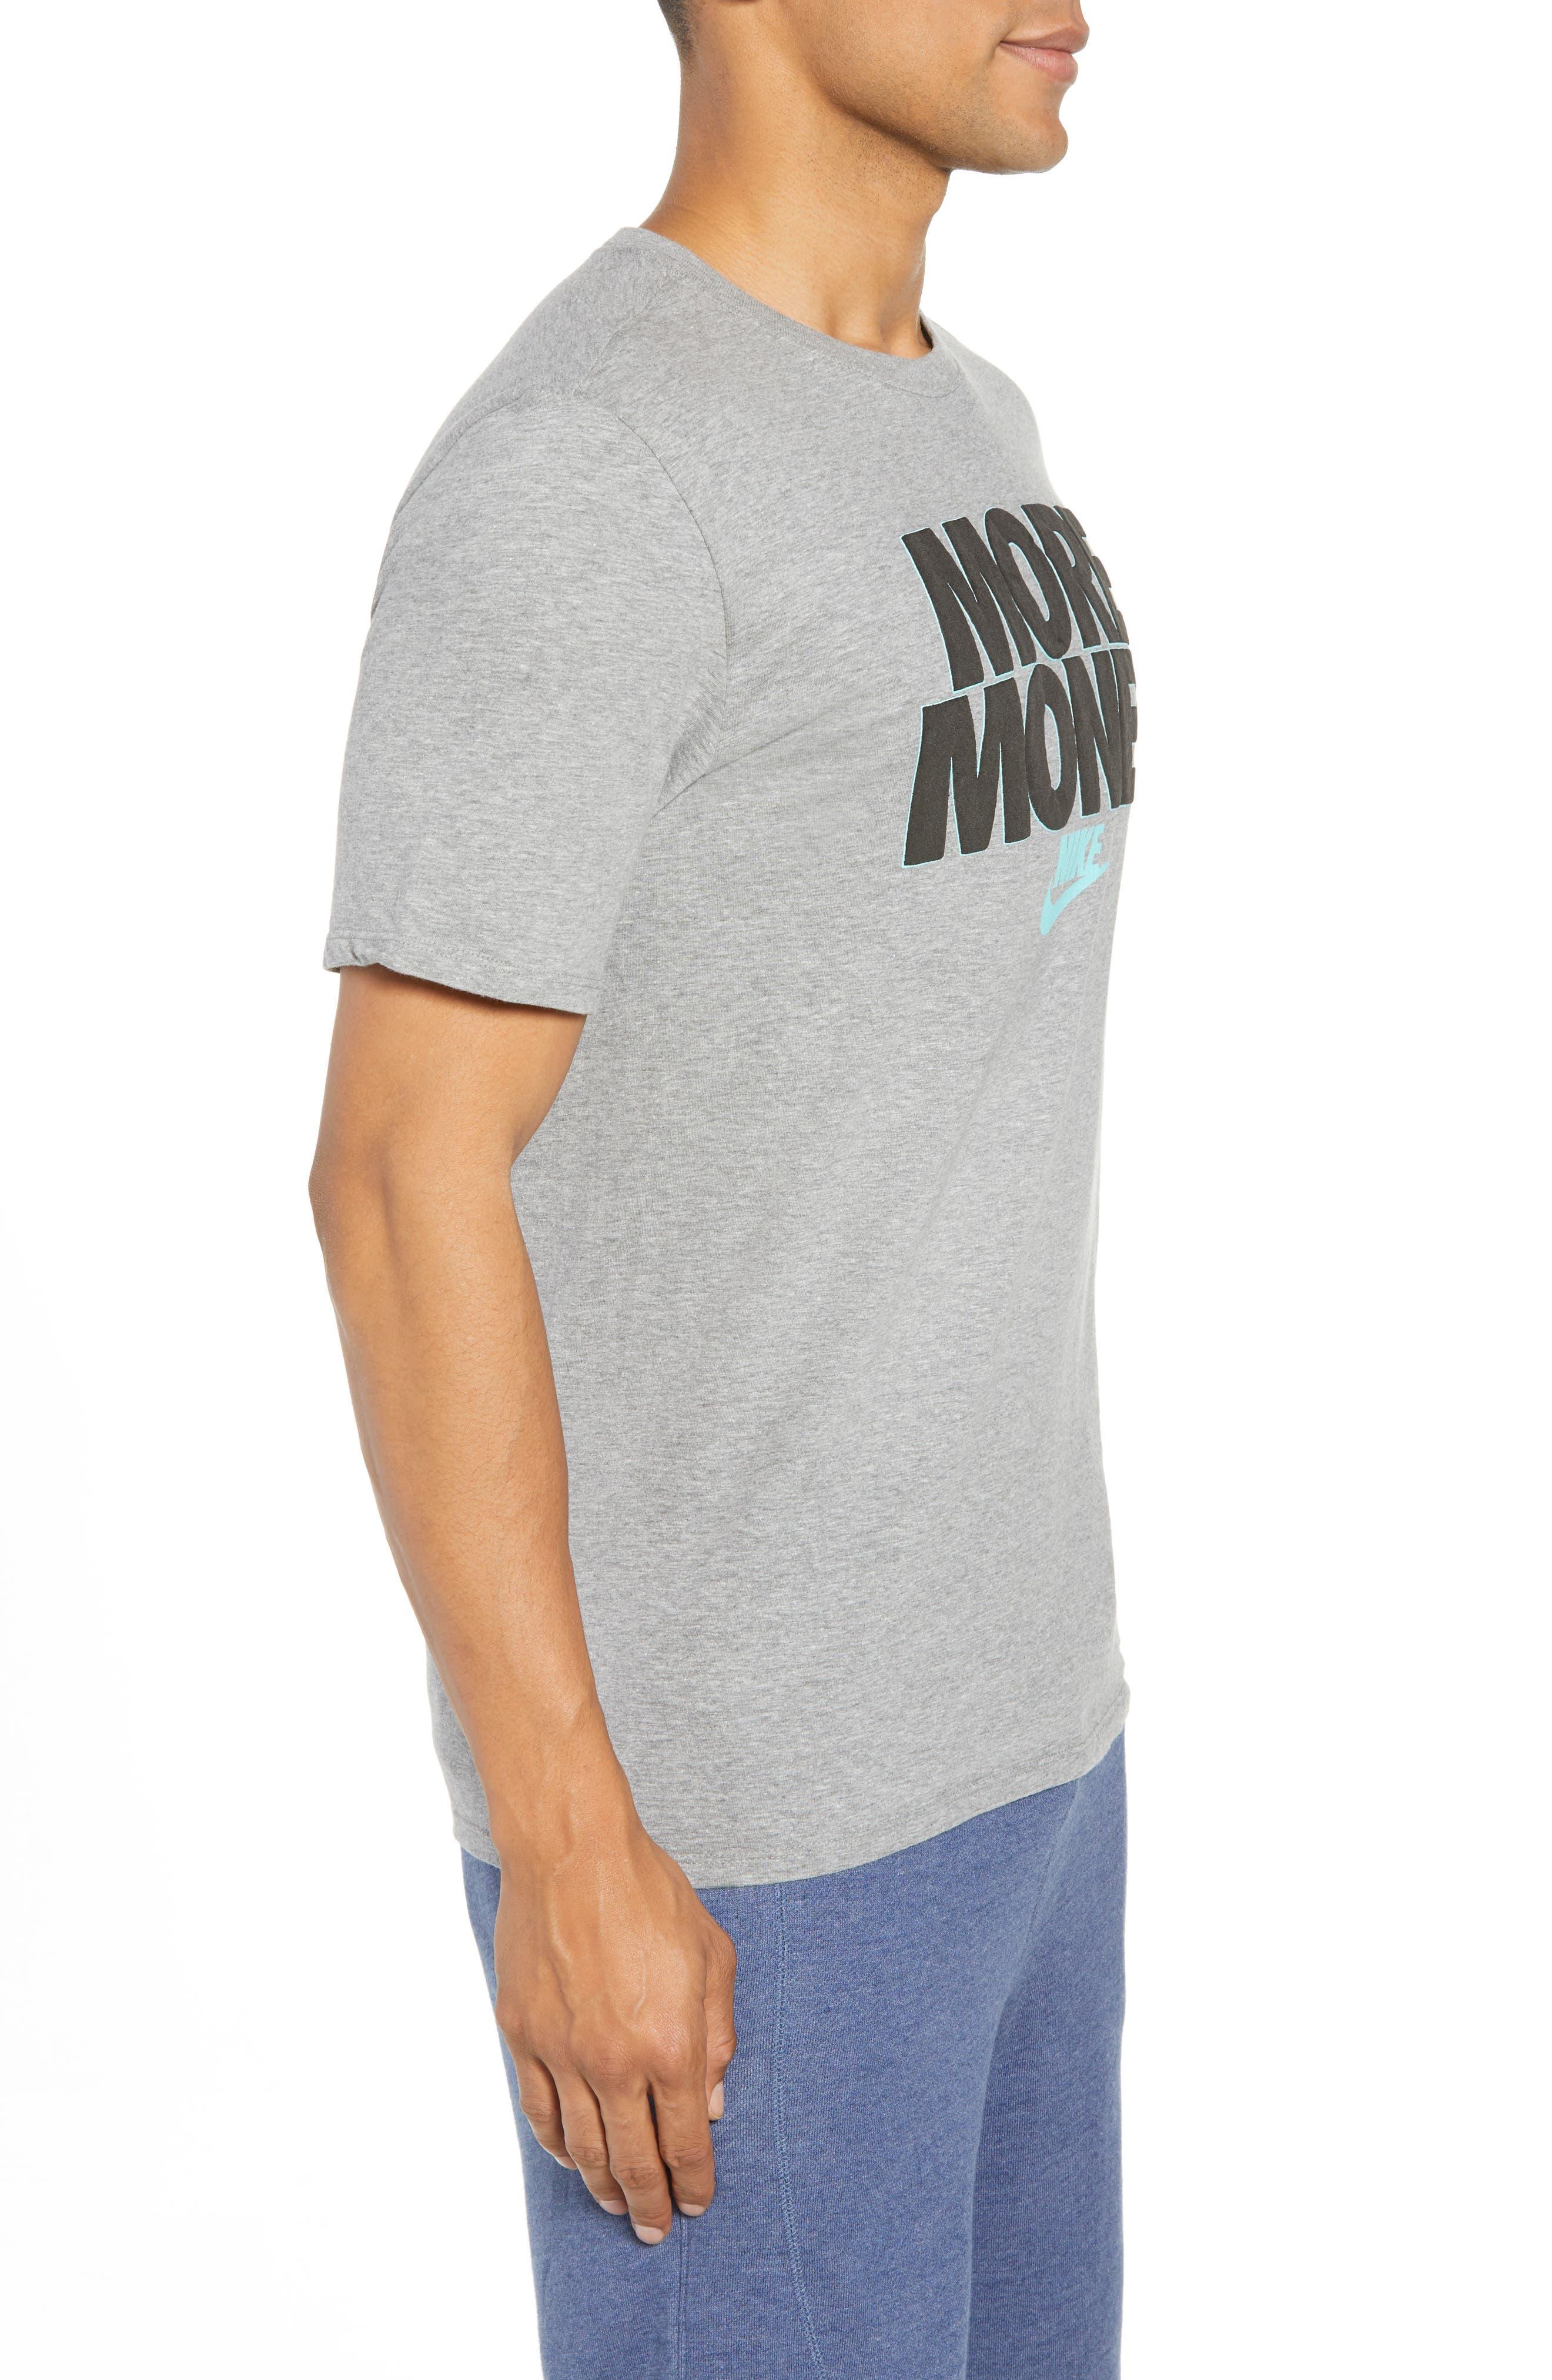 Sportswear More Money T-Shirt,                             Alternate thumbnail 3, color,                             DK GREY HEATHER/ BLACK